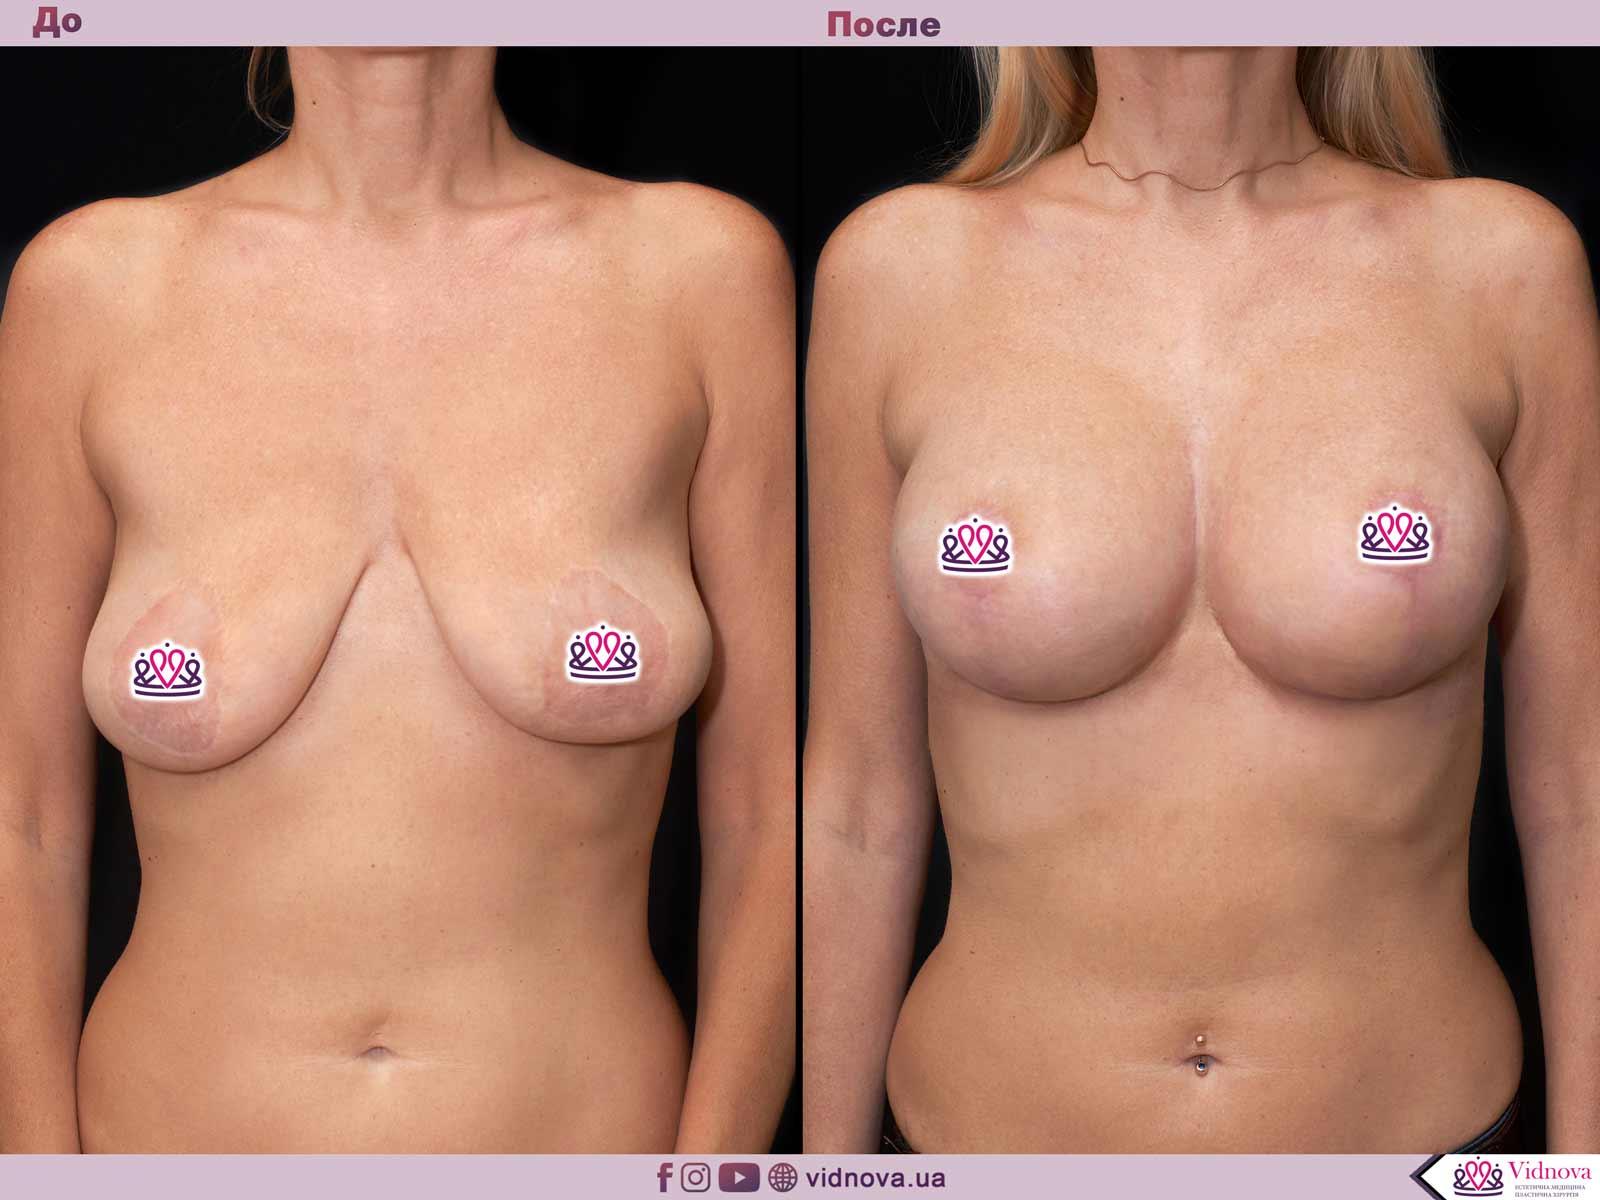 Подтяжка груди: Фото ДО и ПОСЛЕ - Пример №20-1 - Клиника Vidnova